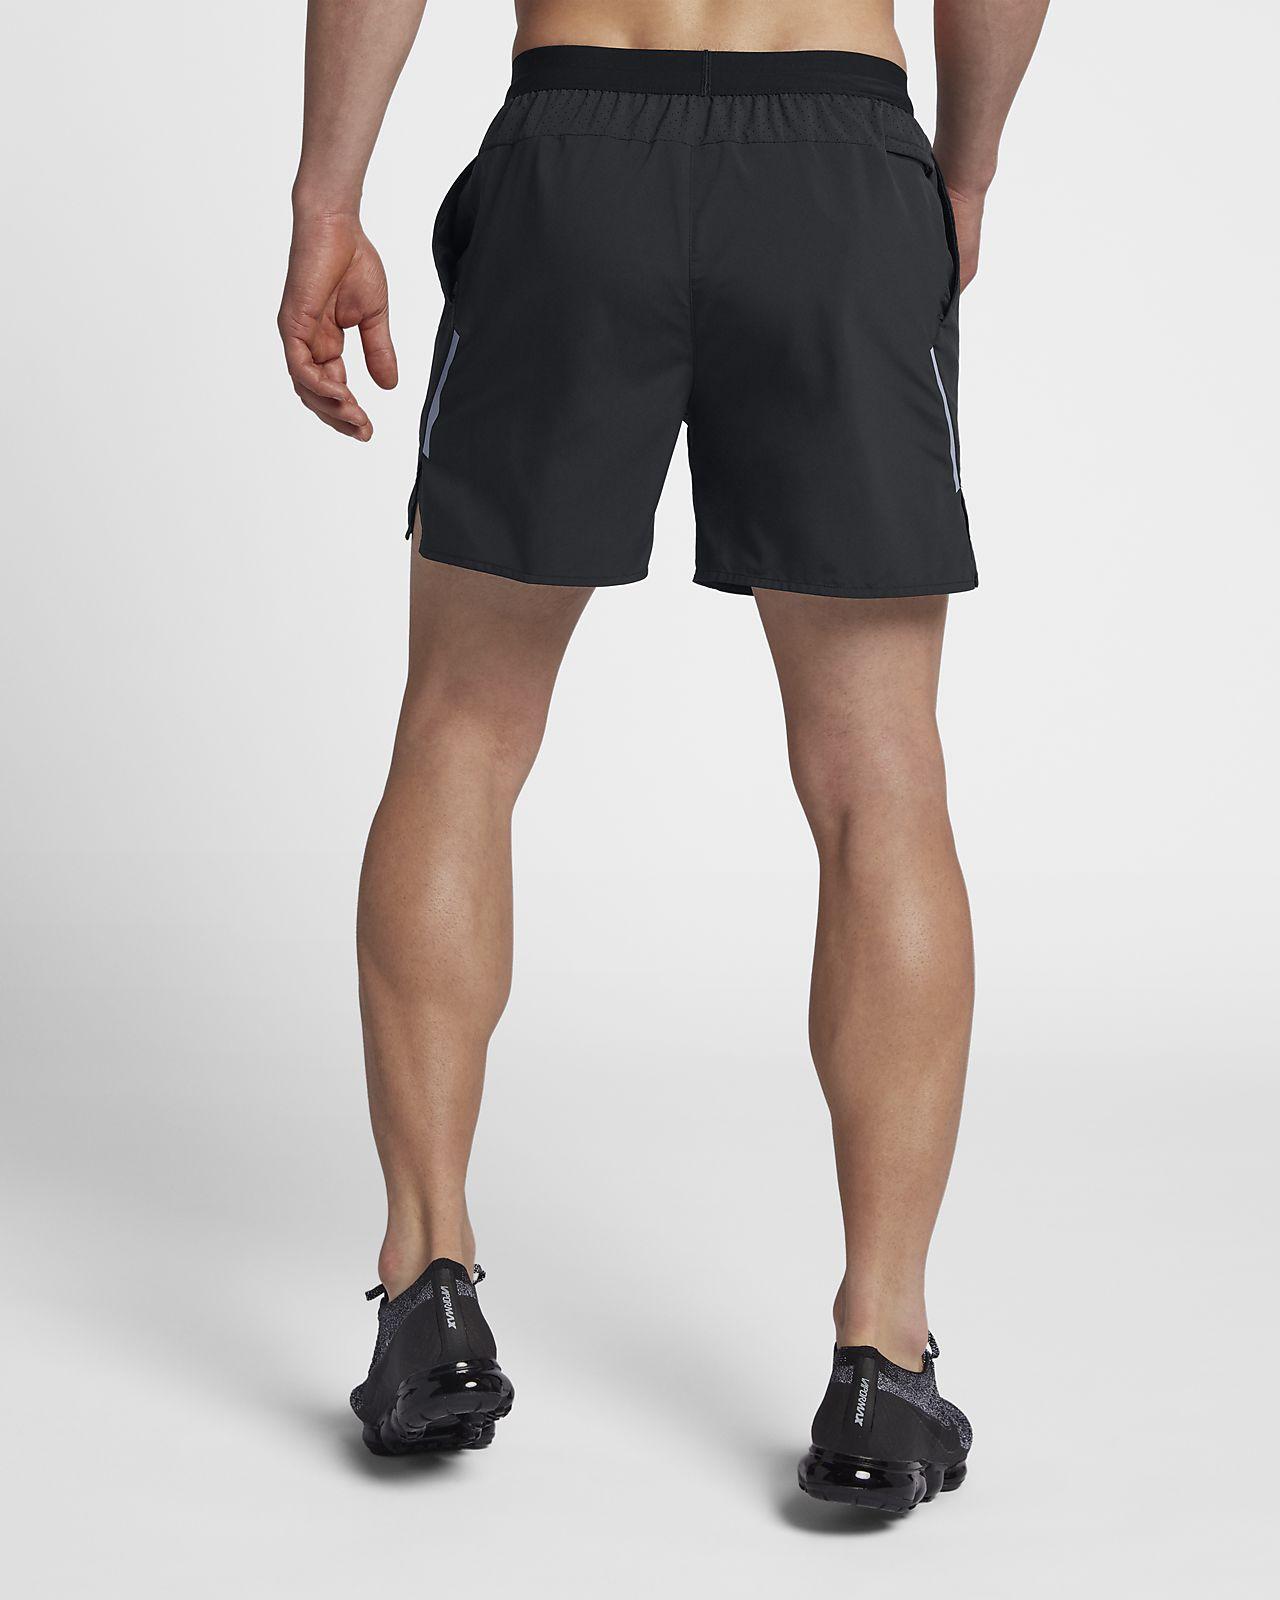 37b6e000740 Nike Flex Stride Men's 5